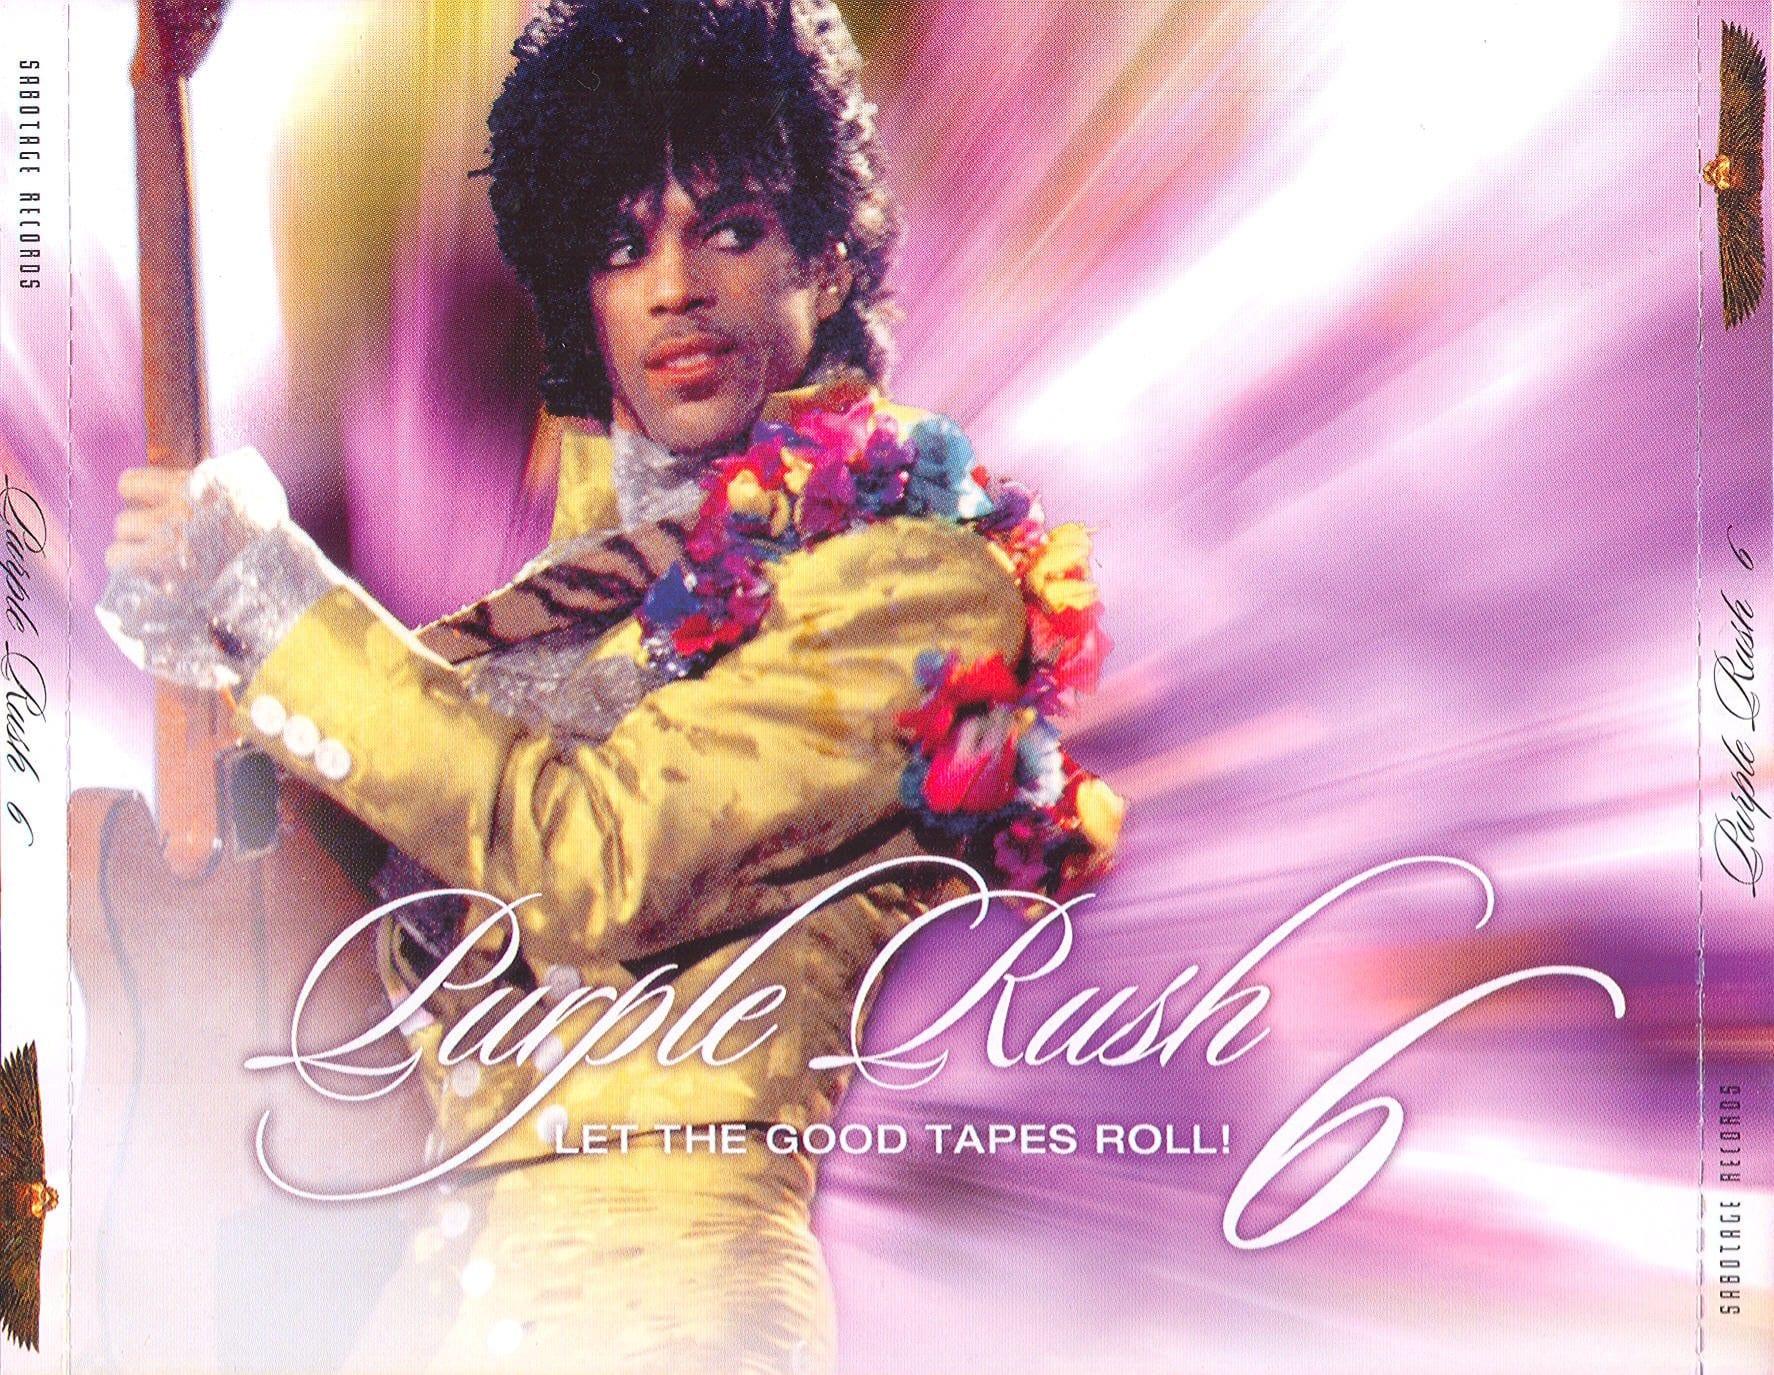 Prince - Purple Rush 3: The Third Shot (Rehearsals 1984) 4 CD SET 9